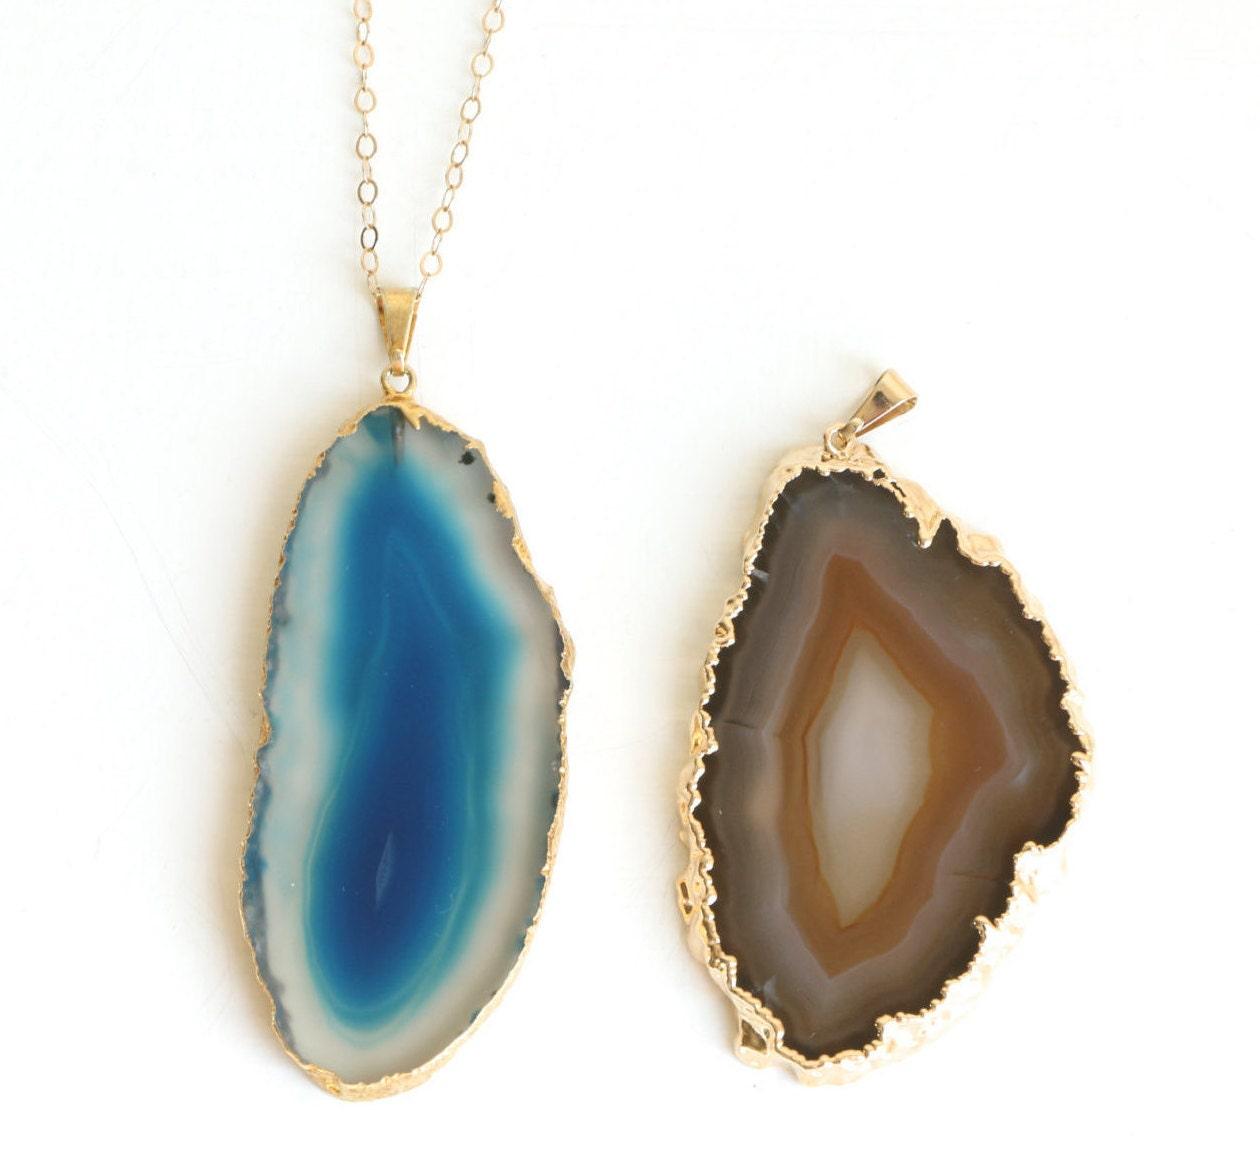 agate slice necklace agate slice pendant necklace geode